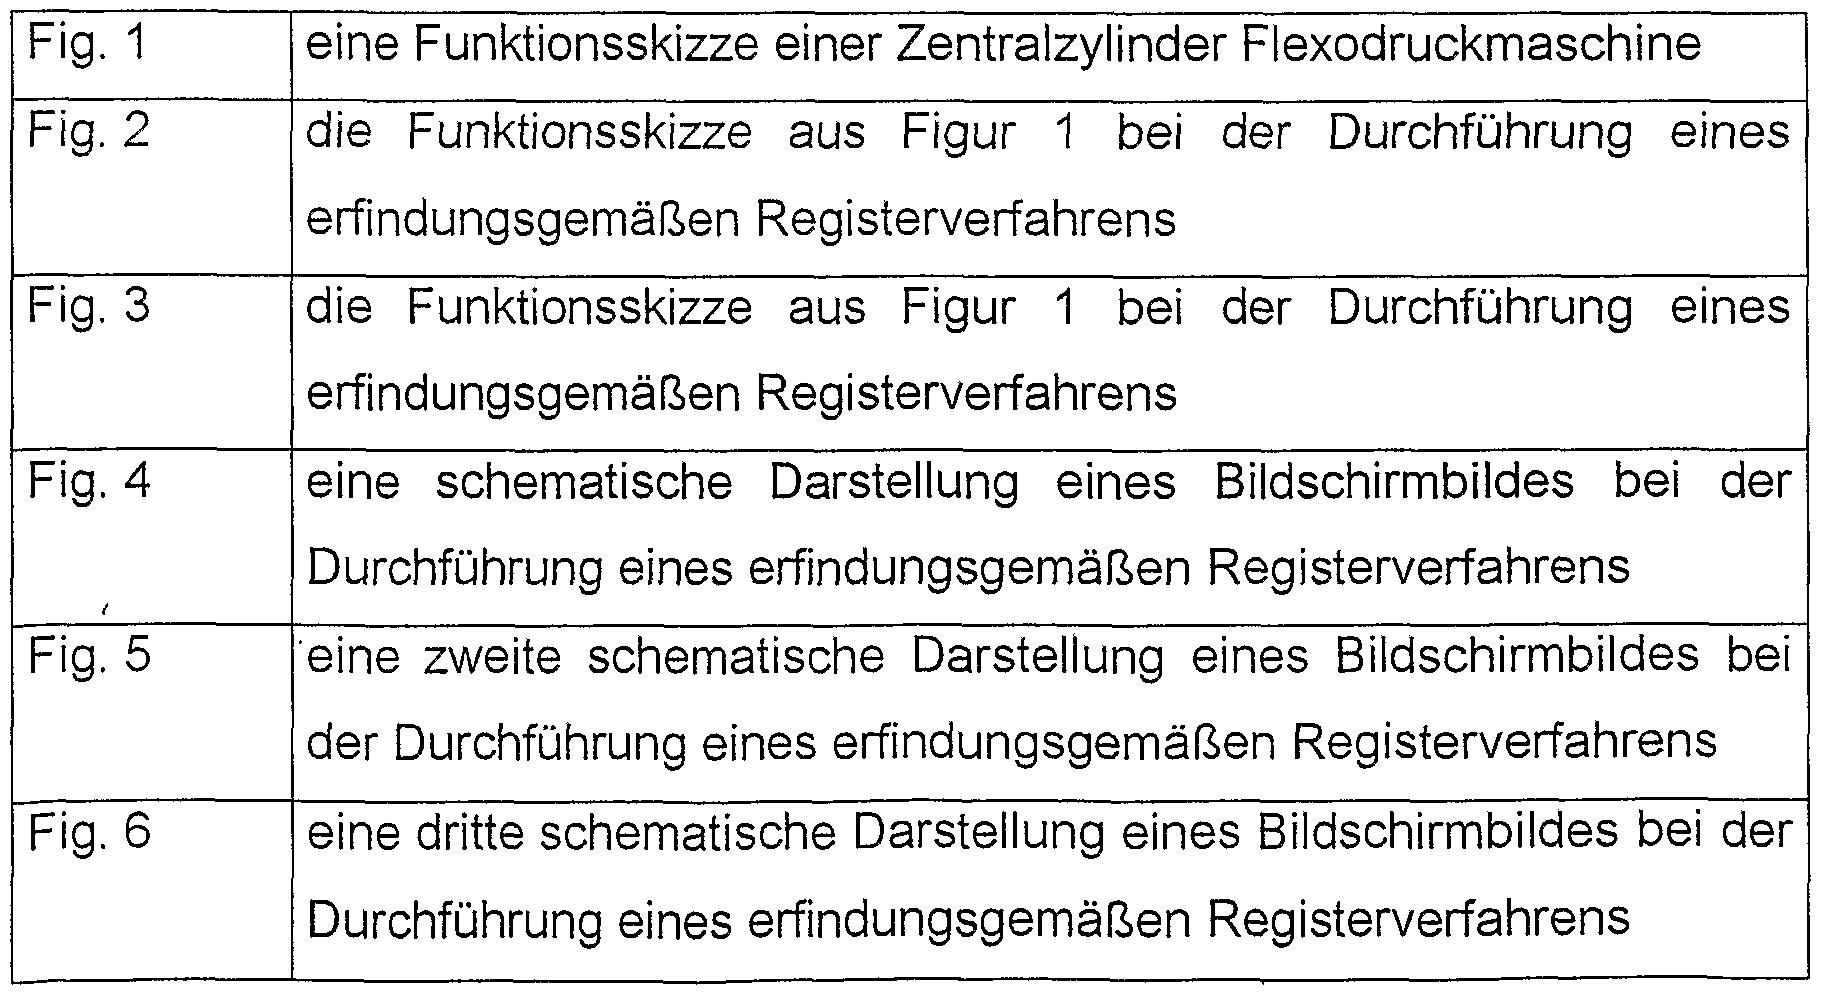 Großzügig Schematische Figur Bilder - Verdrahtungsideen - korsmi.info